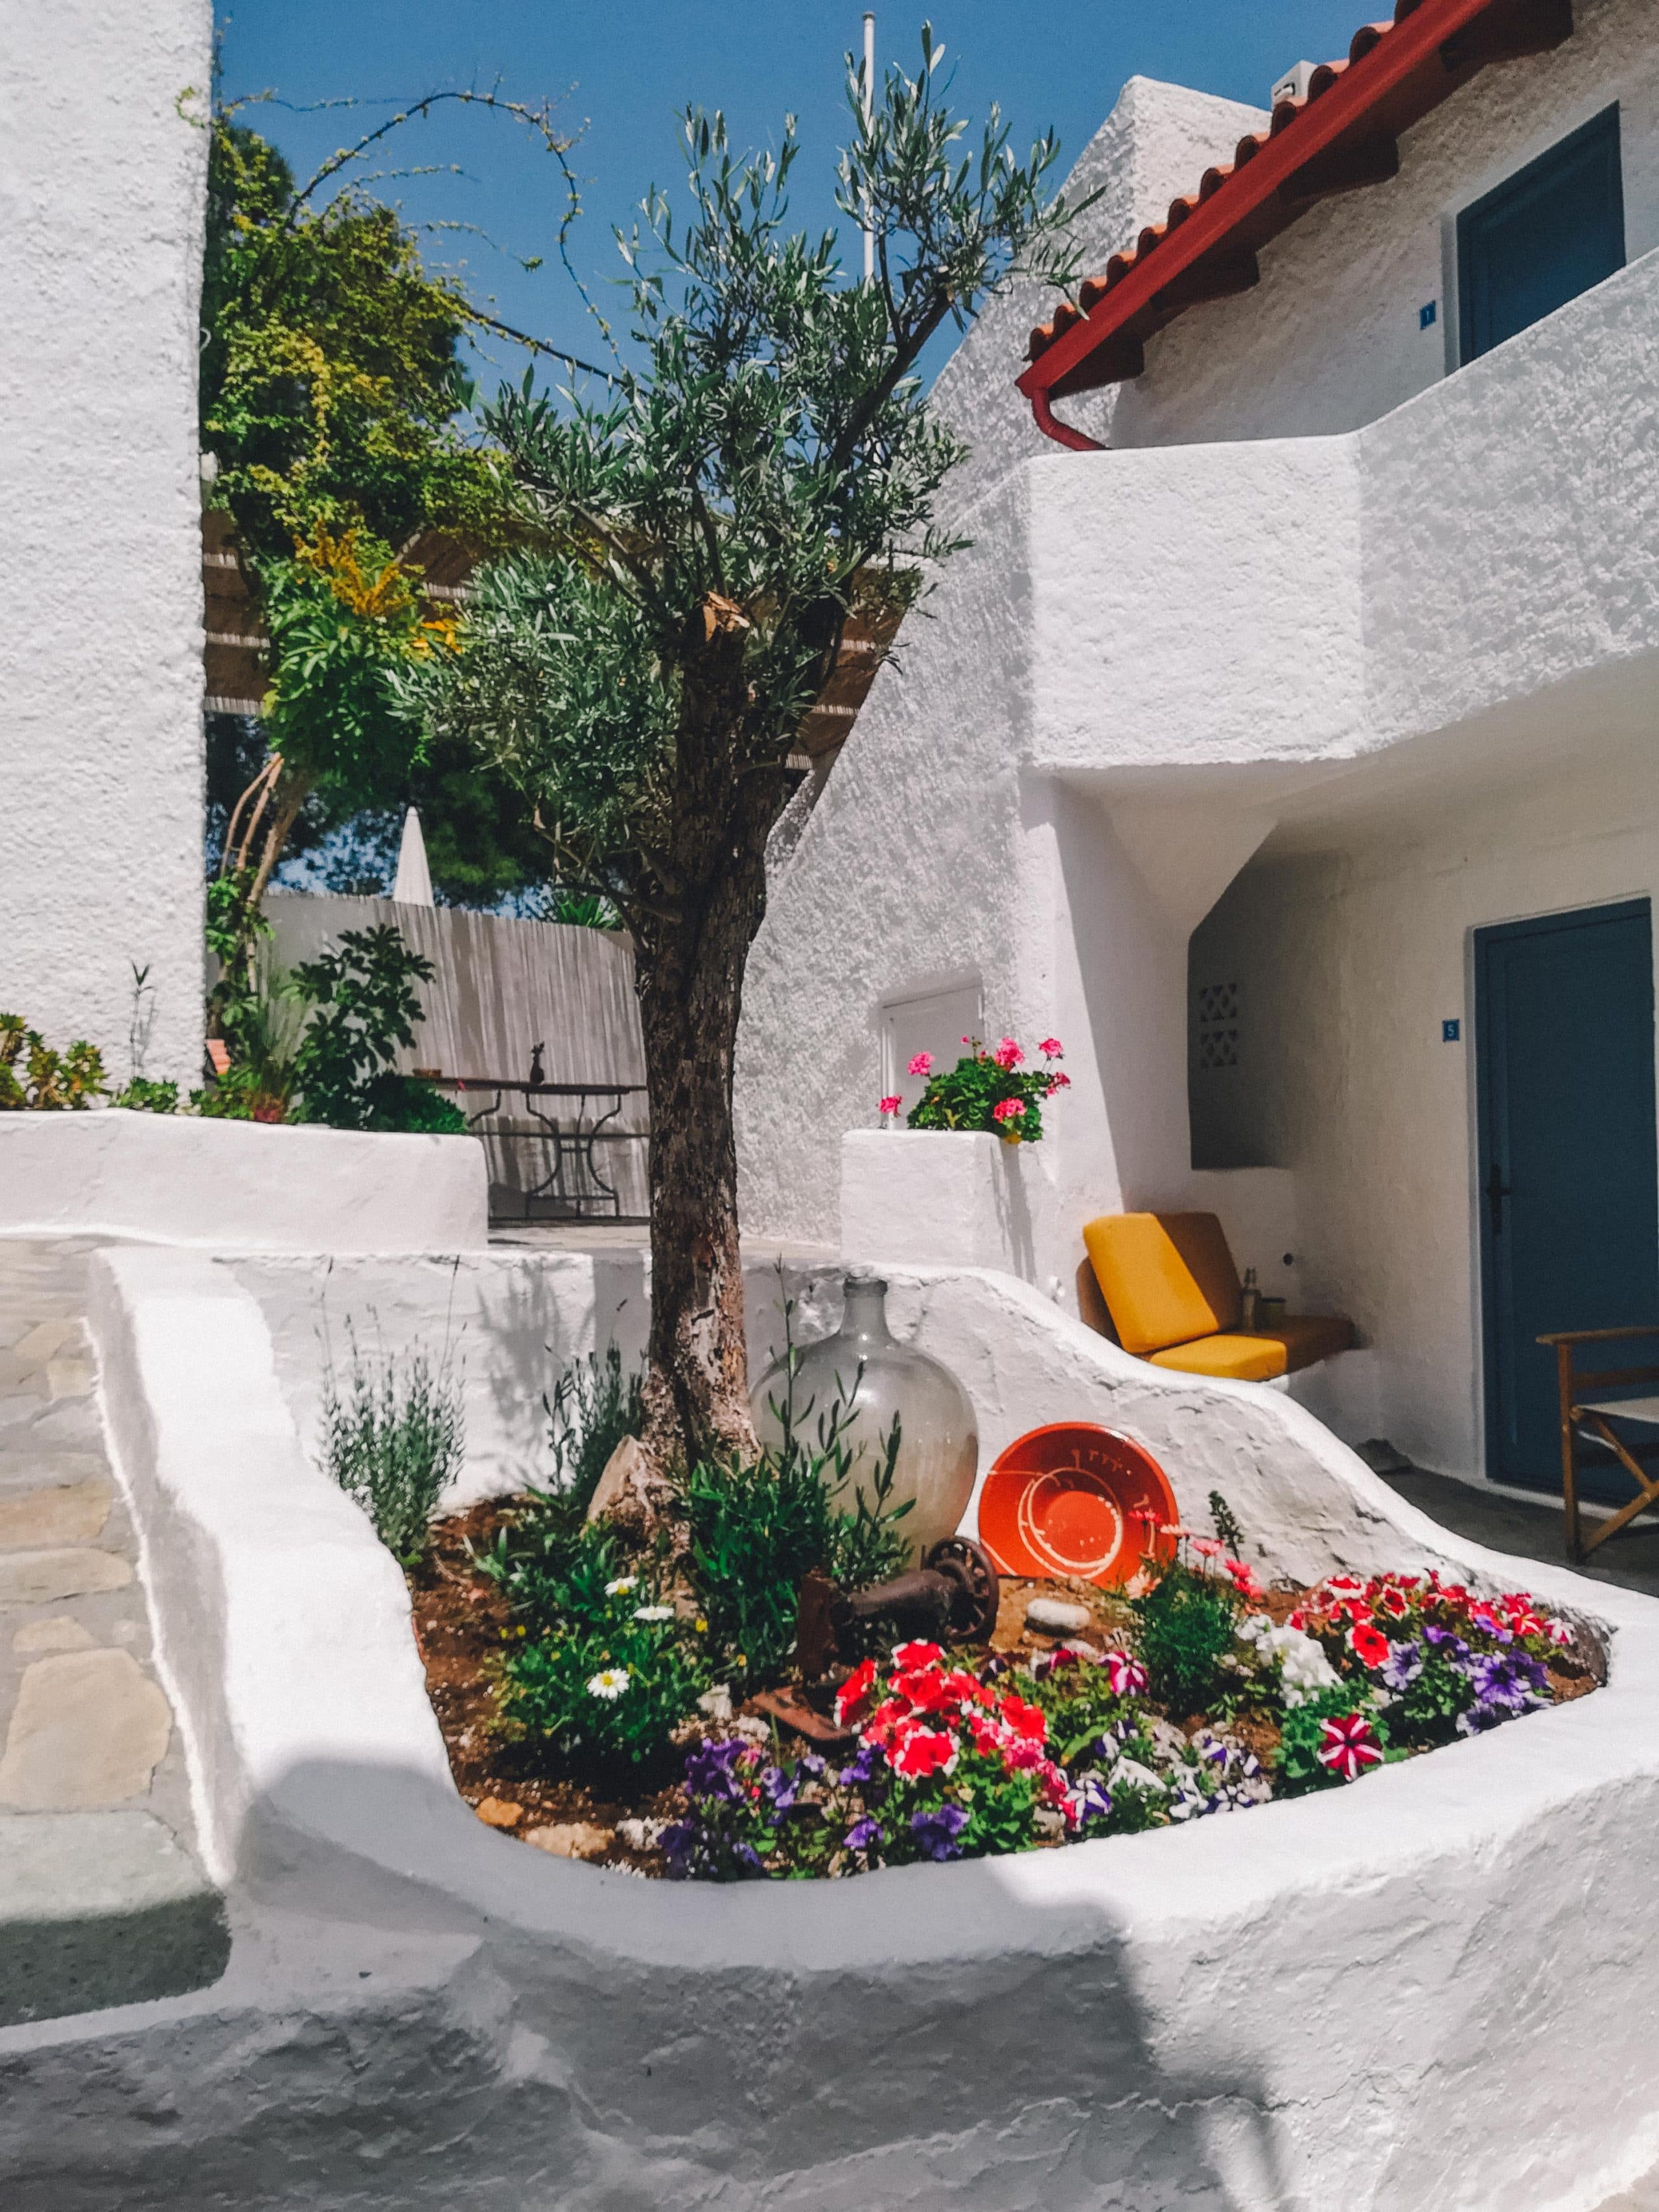 Greek Island Yoga Retreat Accommodation